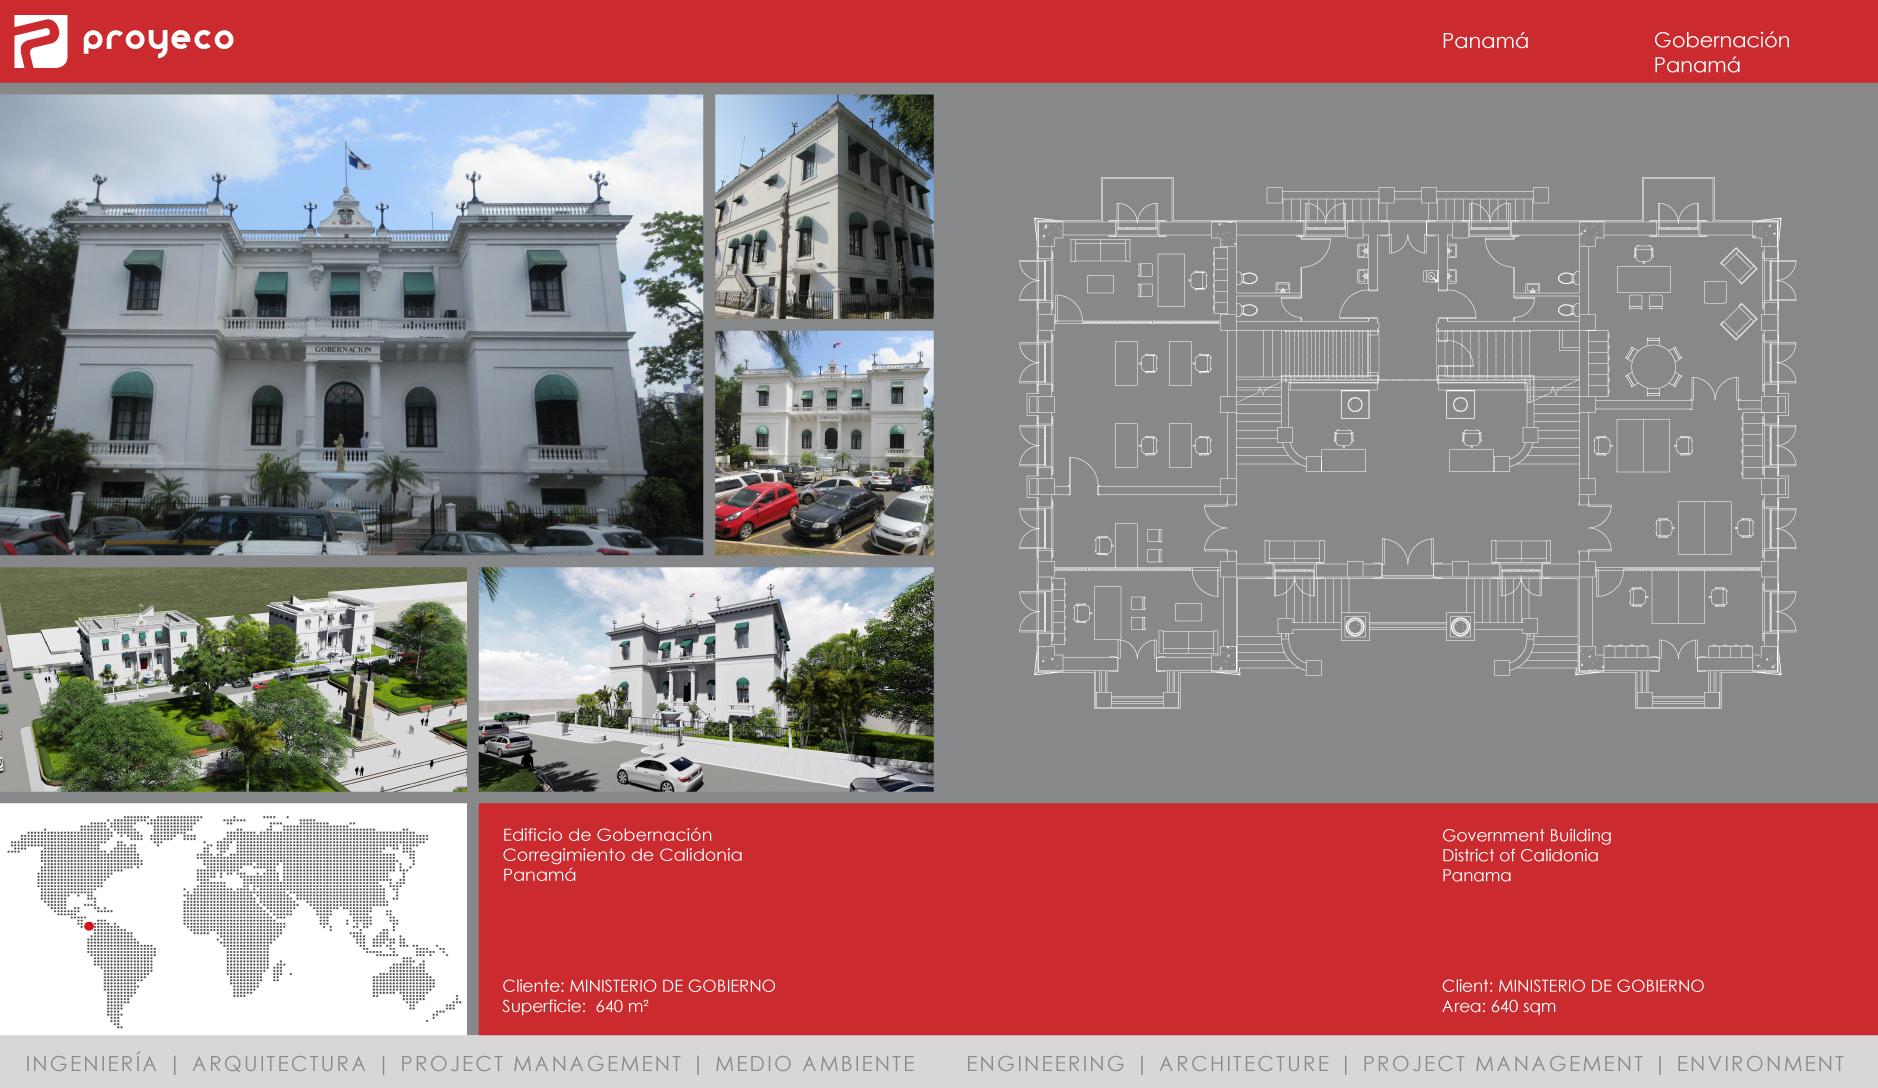 201_Gobernacion-Panama